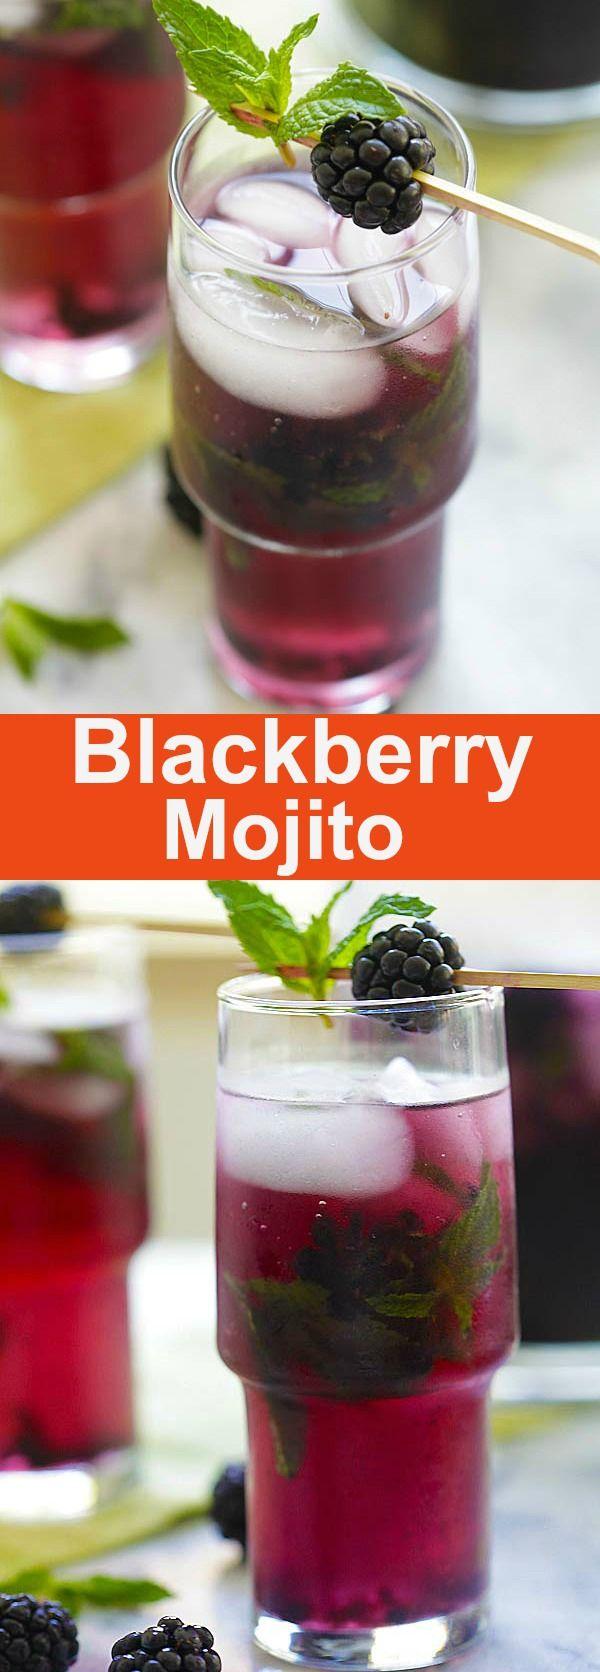 Blackberry Mojito - classic mojito cocktail with loads of blackberry. Fruitiest and booziest homemade mojito recipe ever | rasamalaysia.com